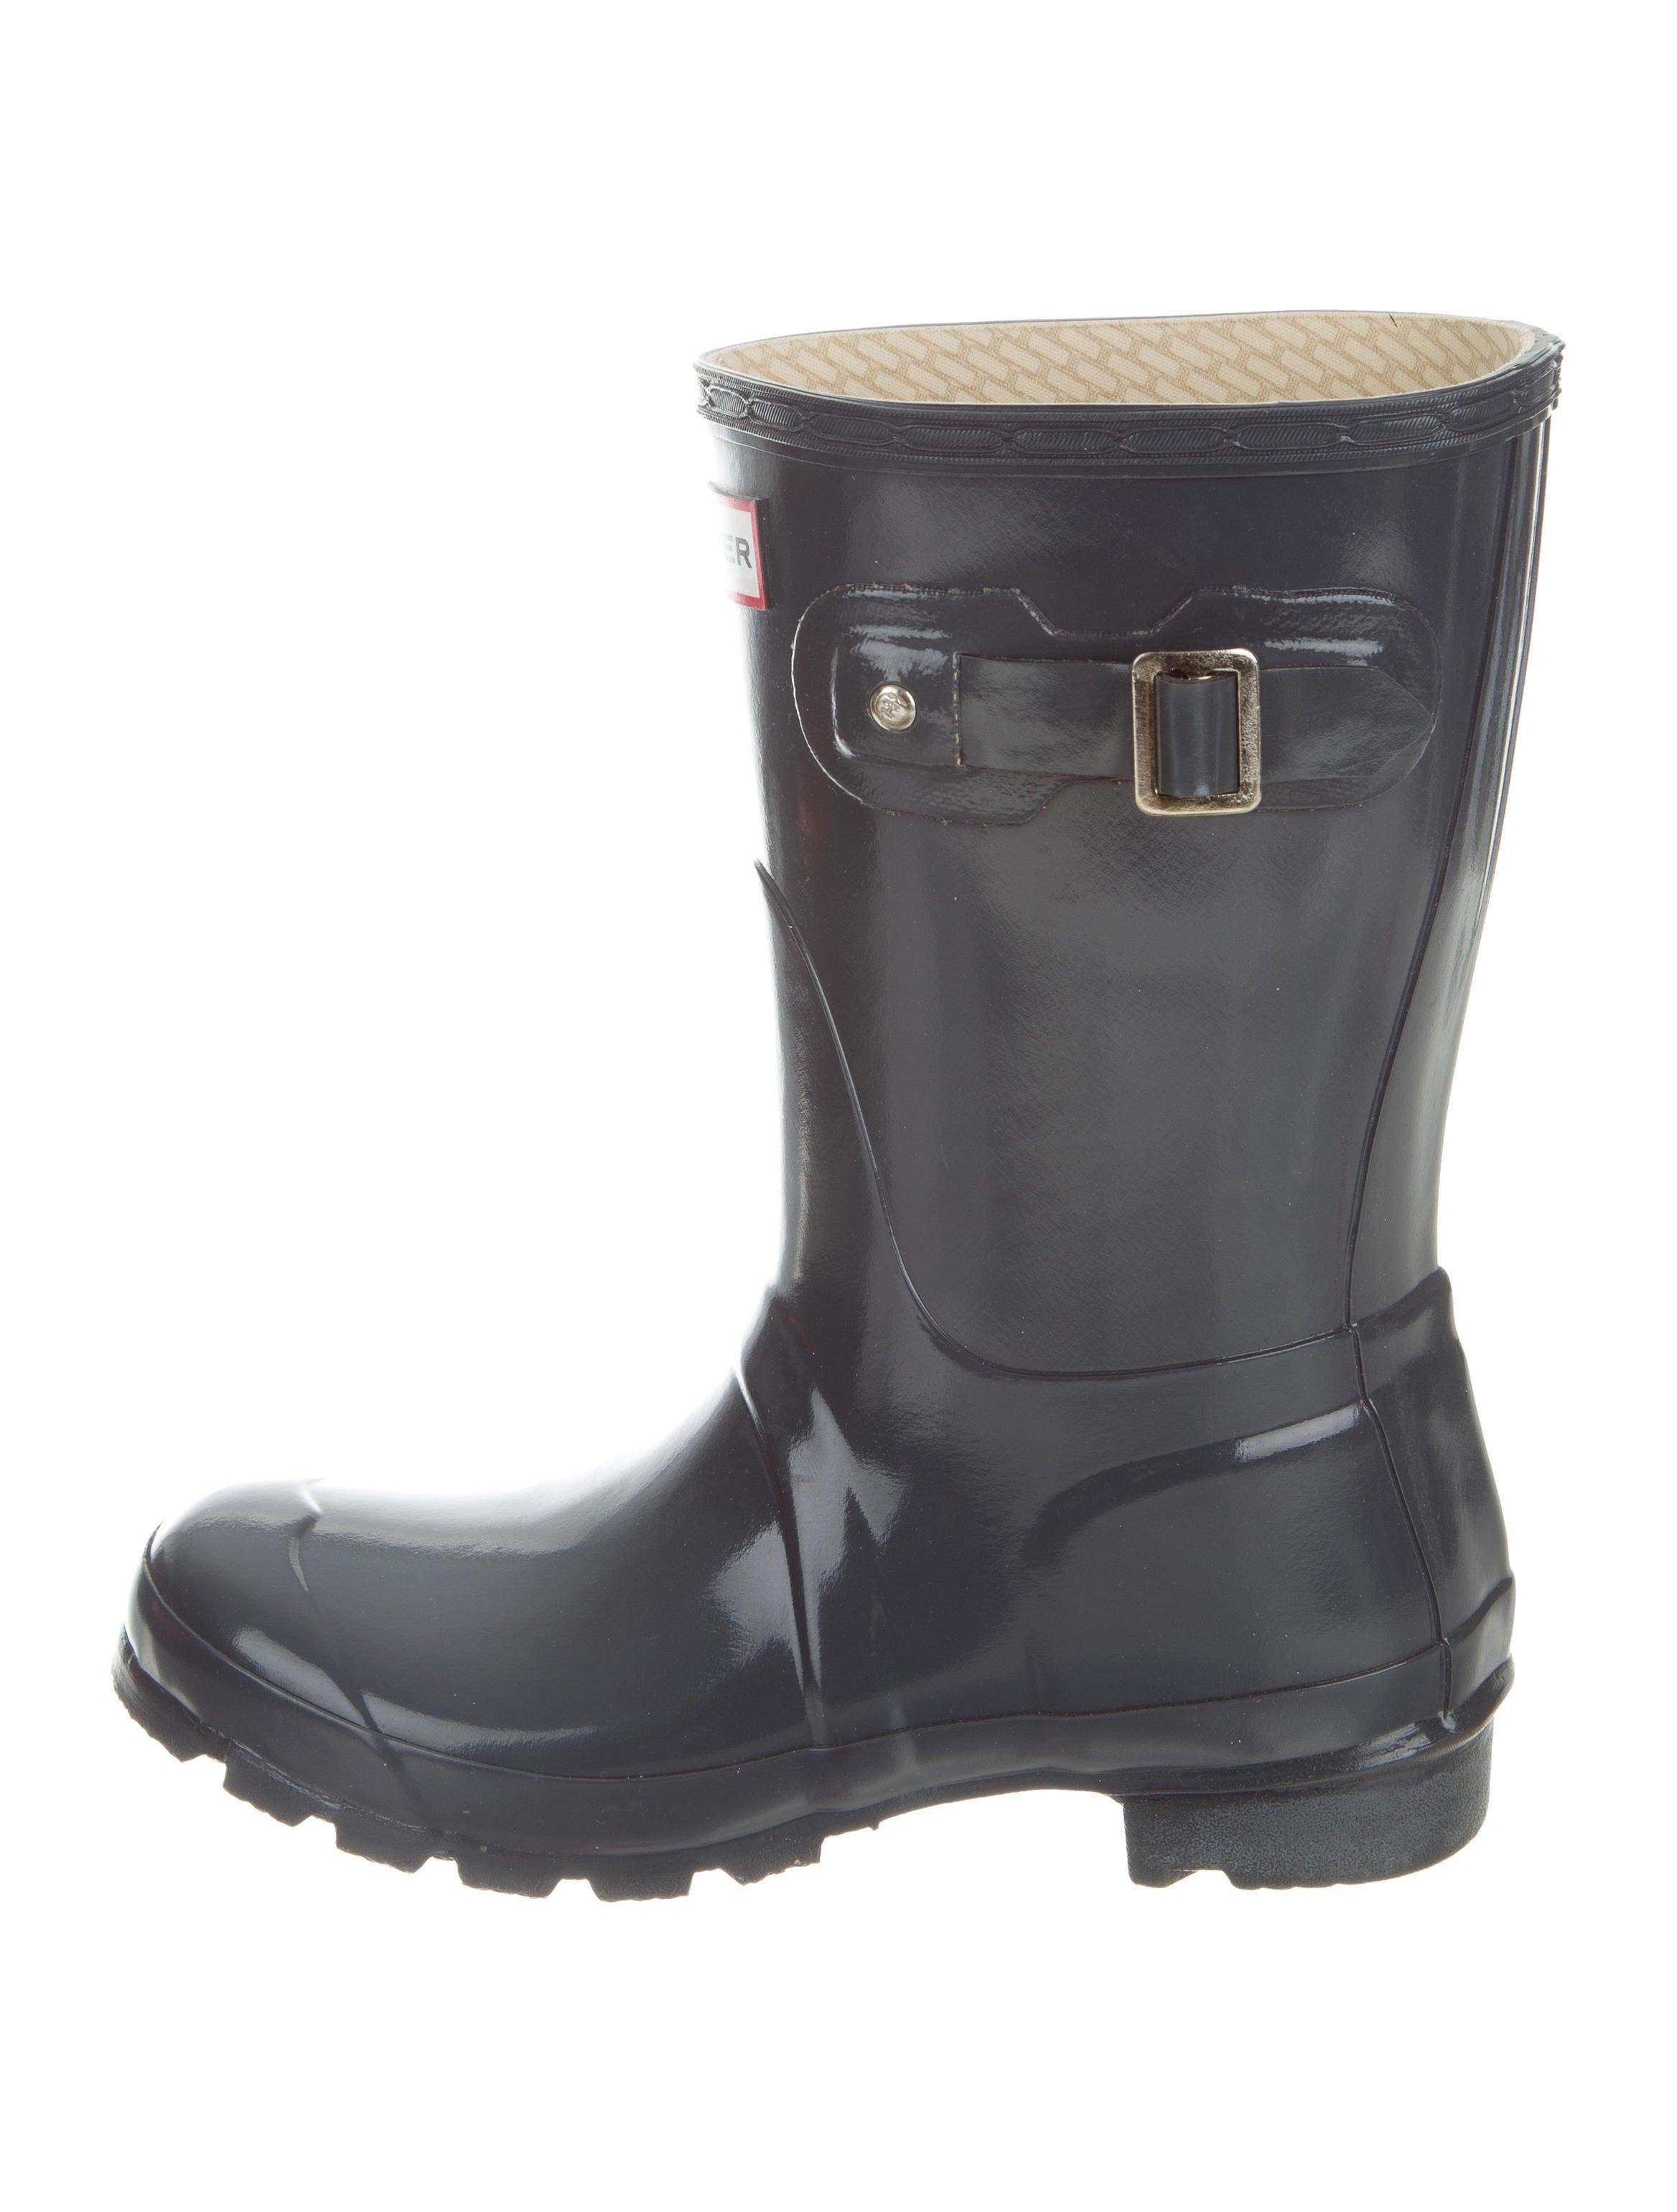 Find great deals on Kids Rain Boots at Kohl's today! Sponsored Links Rocky Core Rubber Toddler Waterproof Outdoor Boots. Regular. $ Western Chief Boys' Camouflage Light-Up Rain Boots. Regular. $ Kamik Riptide Girls' Rainboots. Regular. $